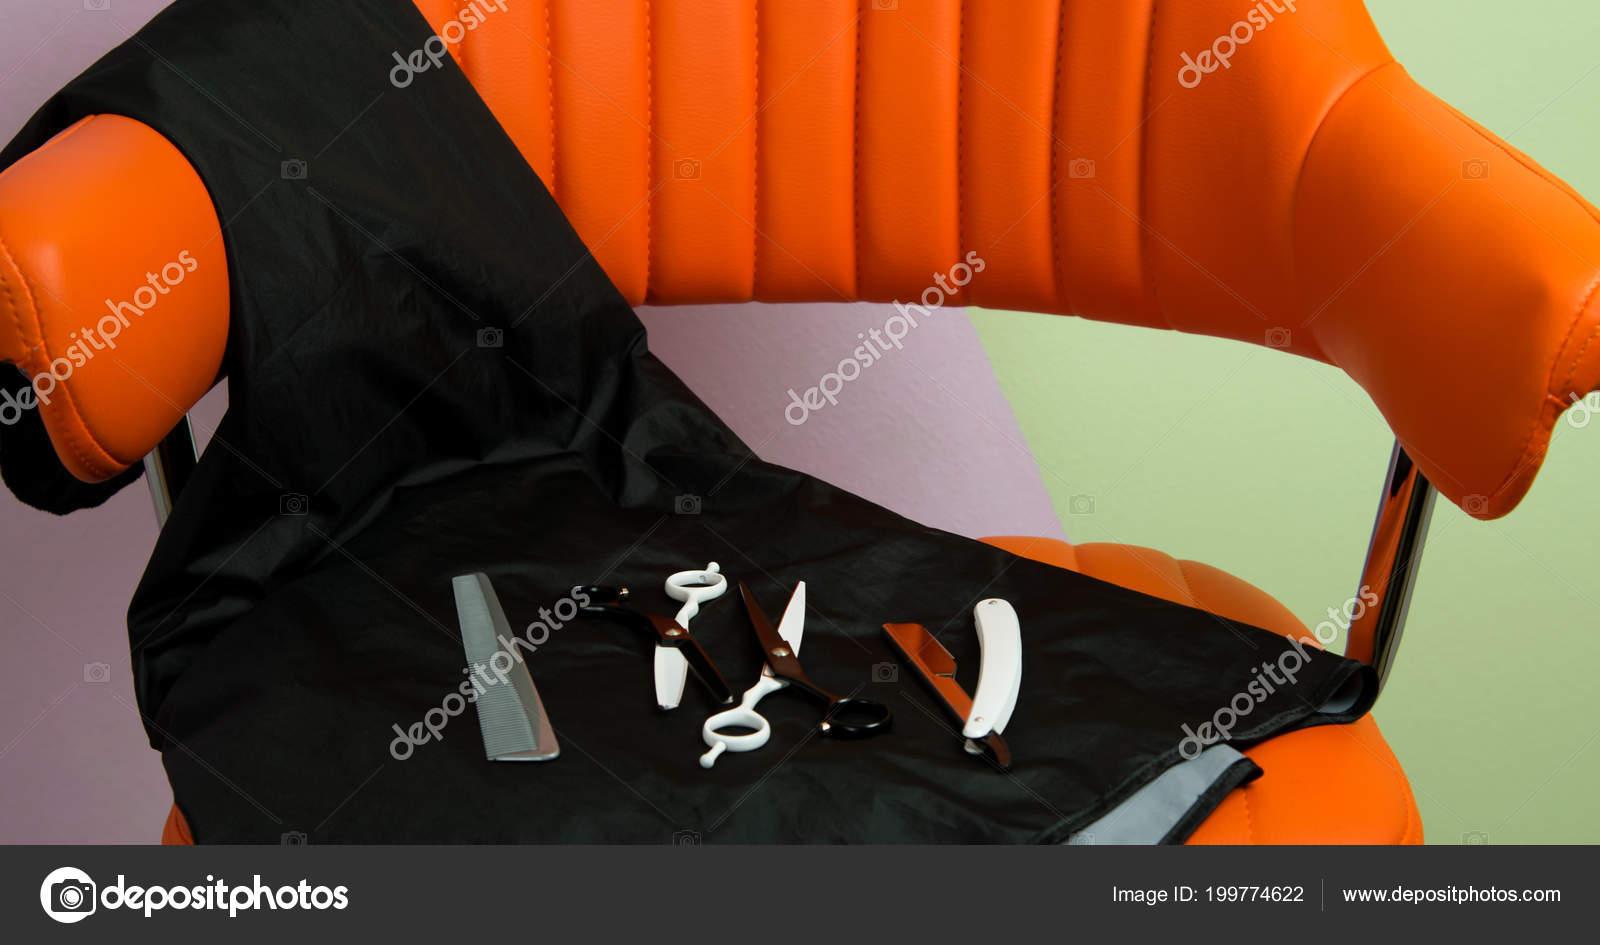 orange chair salon handicap mobile chairs beauty lie tools haircuts scissors shaving razor stock photo